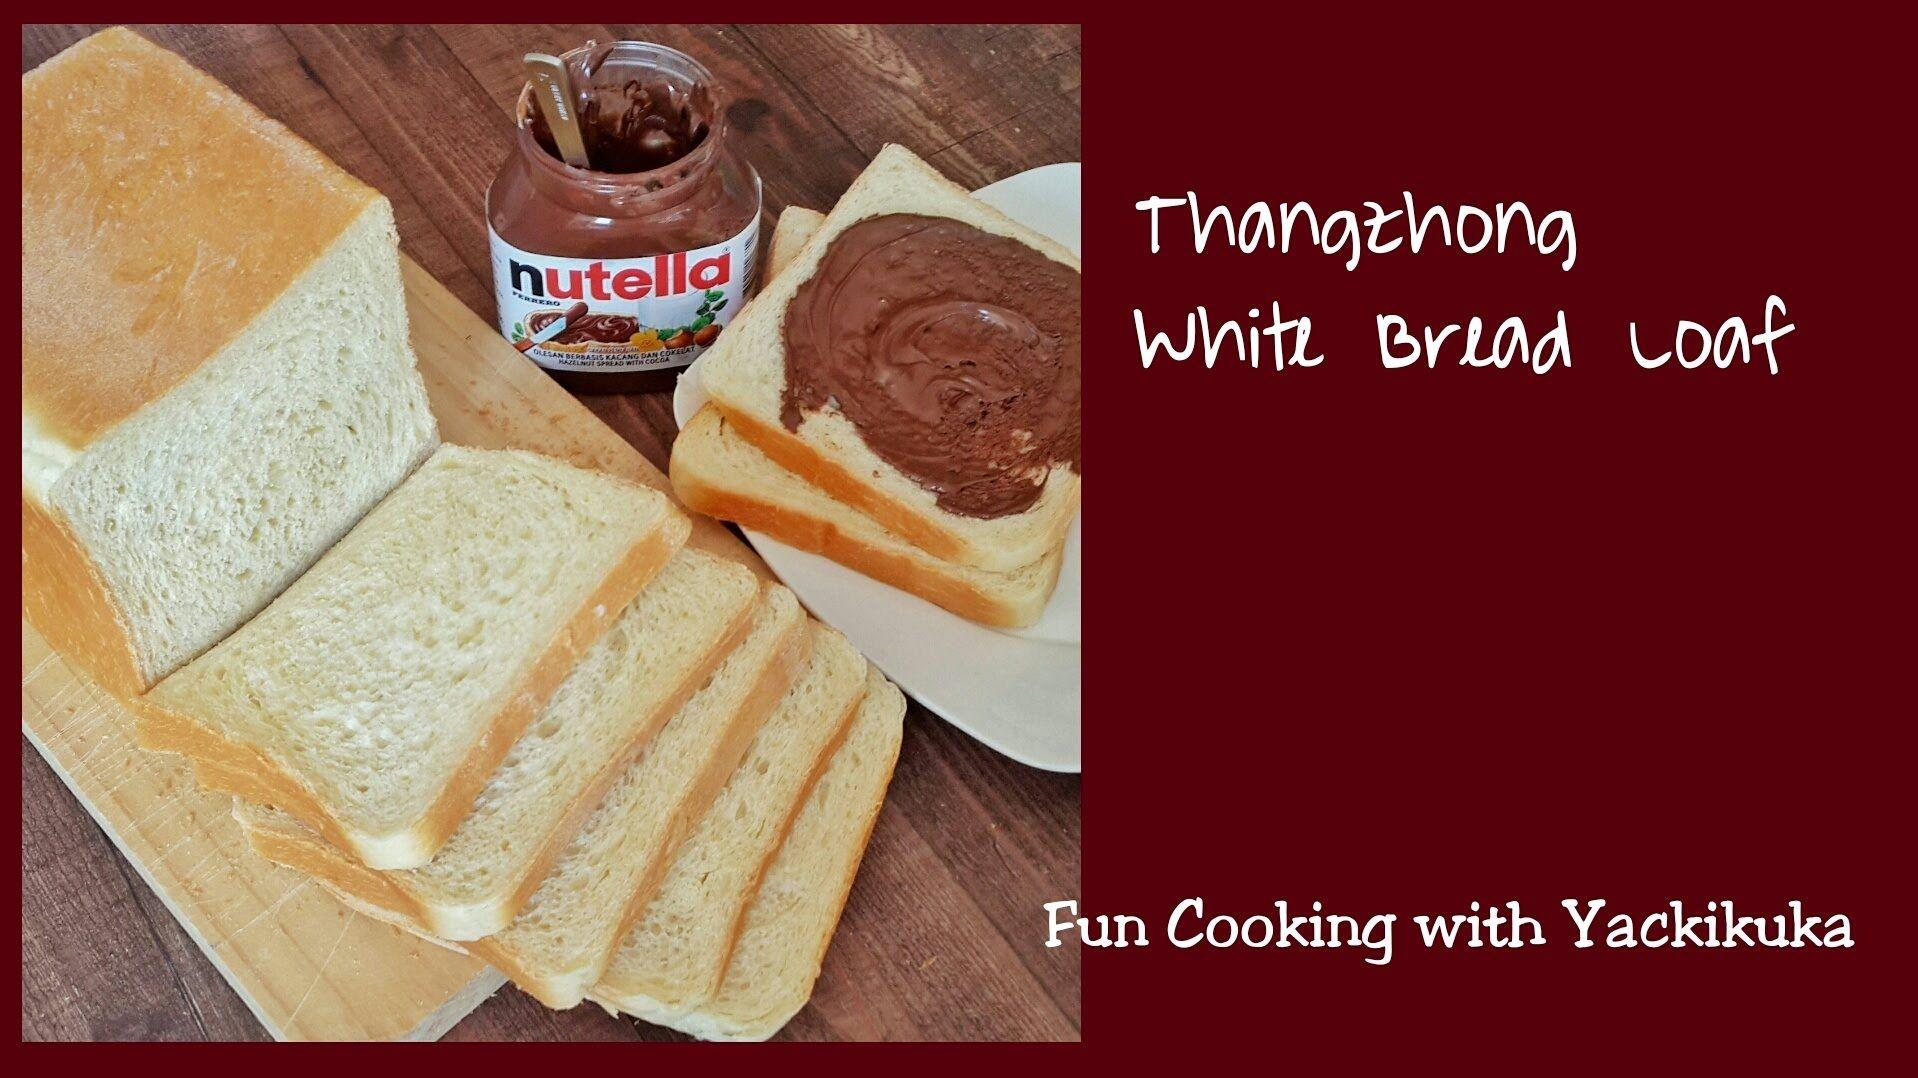 Thangzhong Bread Loaf Resep Roti Tawar Yackikuka Bread Fun Cooking Loaf Bread